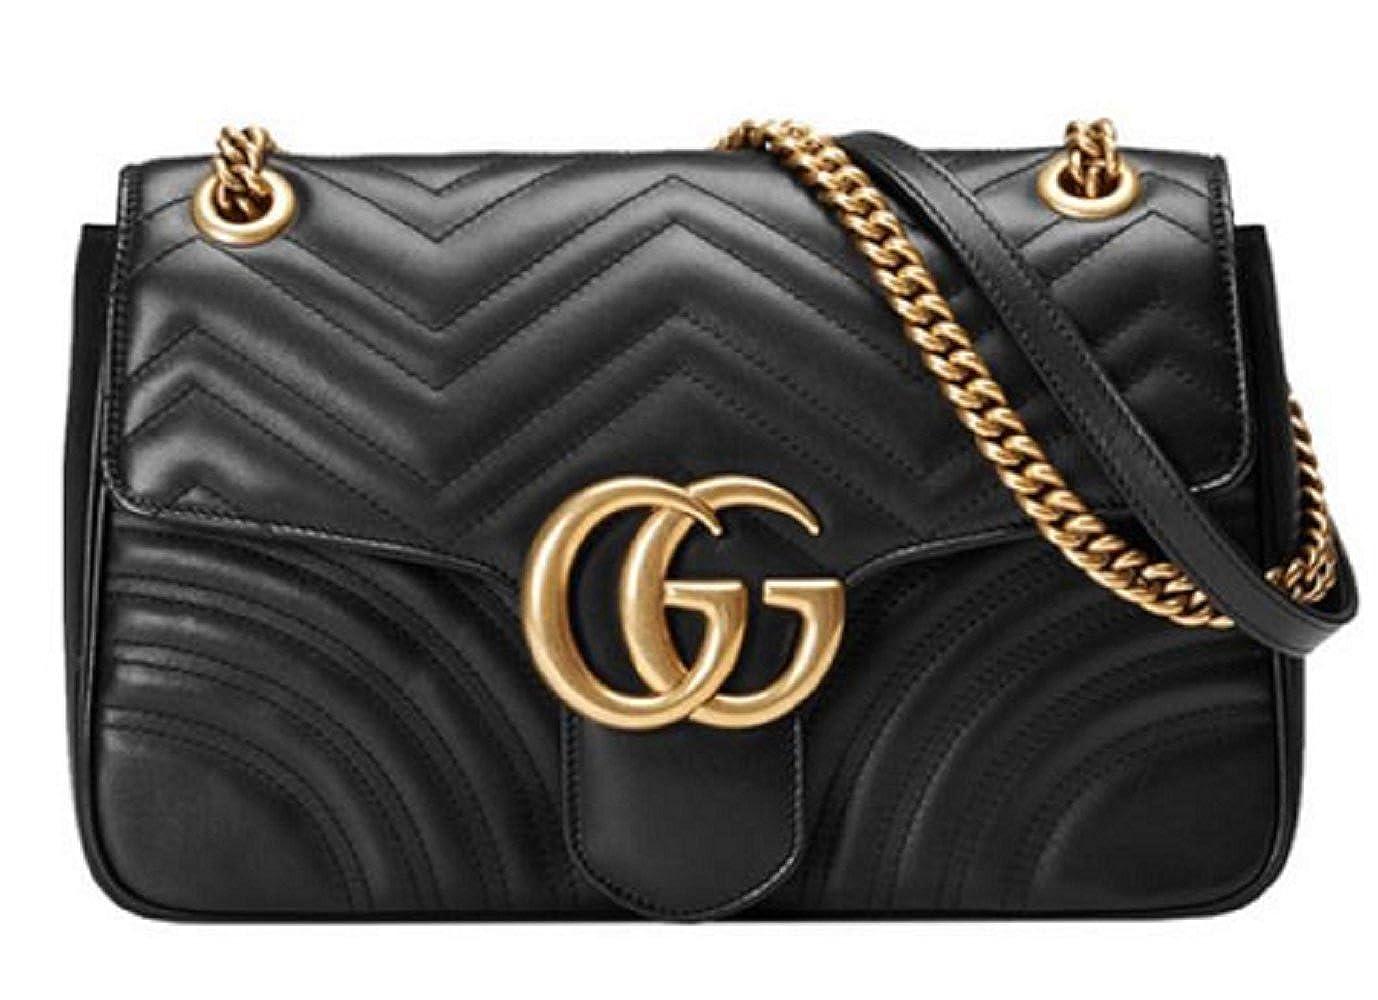 Gucci.Women s GG Marmont Medium Inclined Shoulder Bag  Amazon.ca  Shoes    Handbags 26ecb34728330